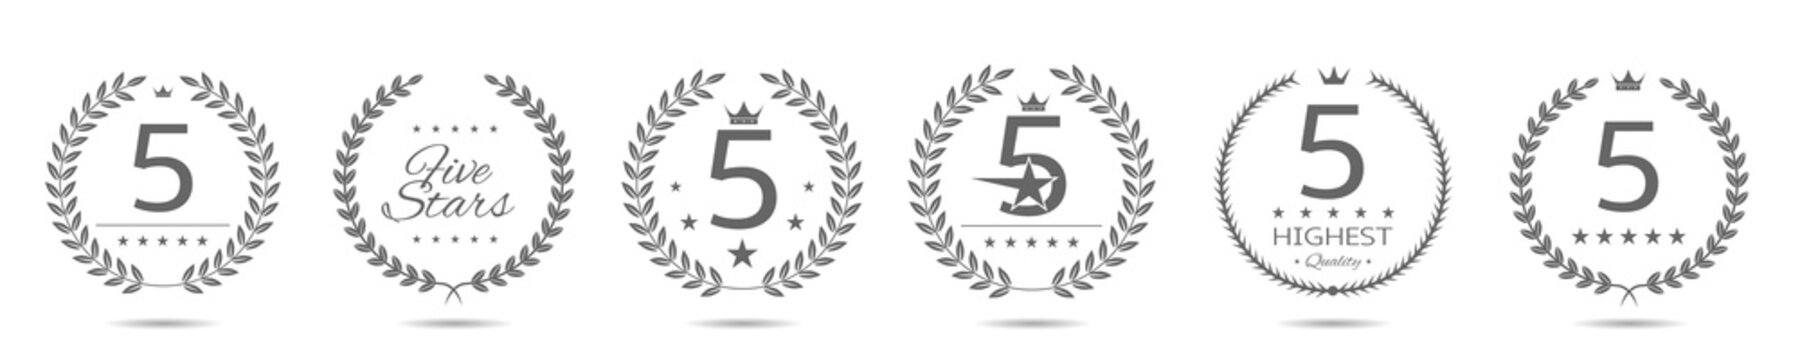 Five star badge set